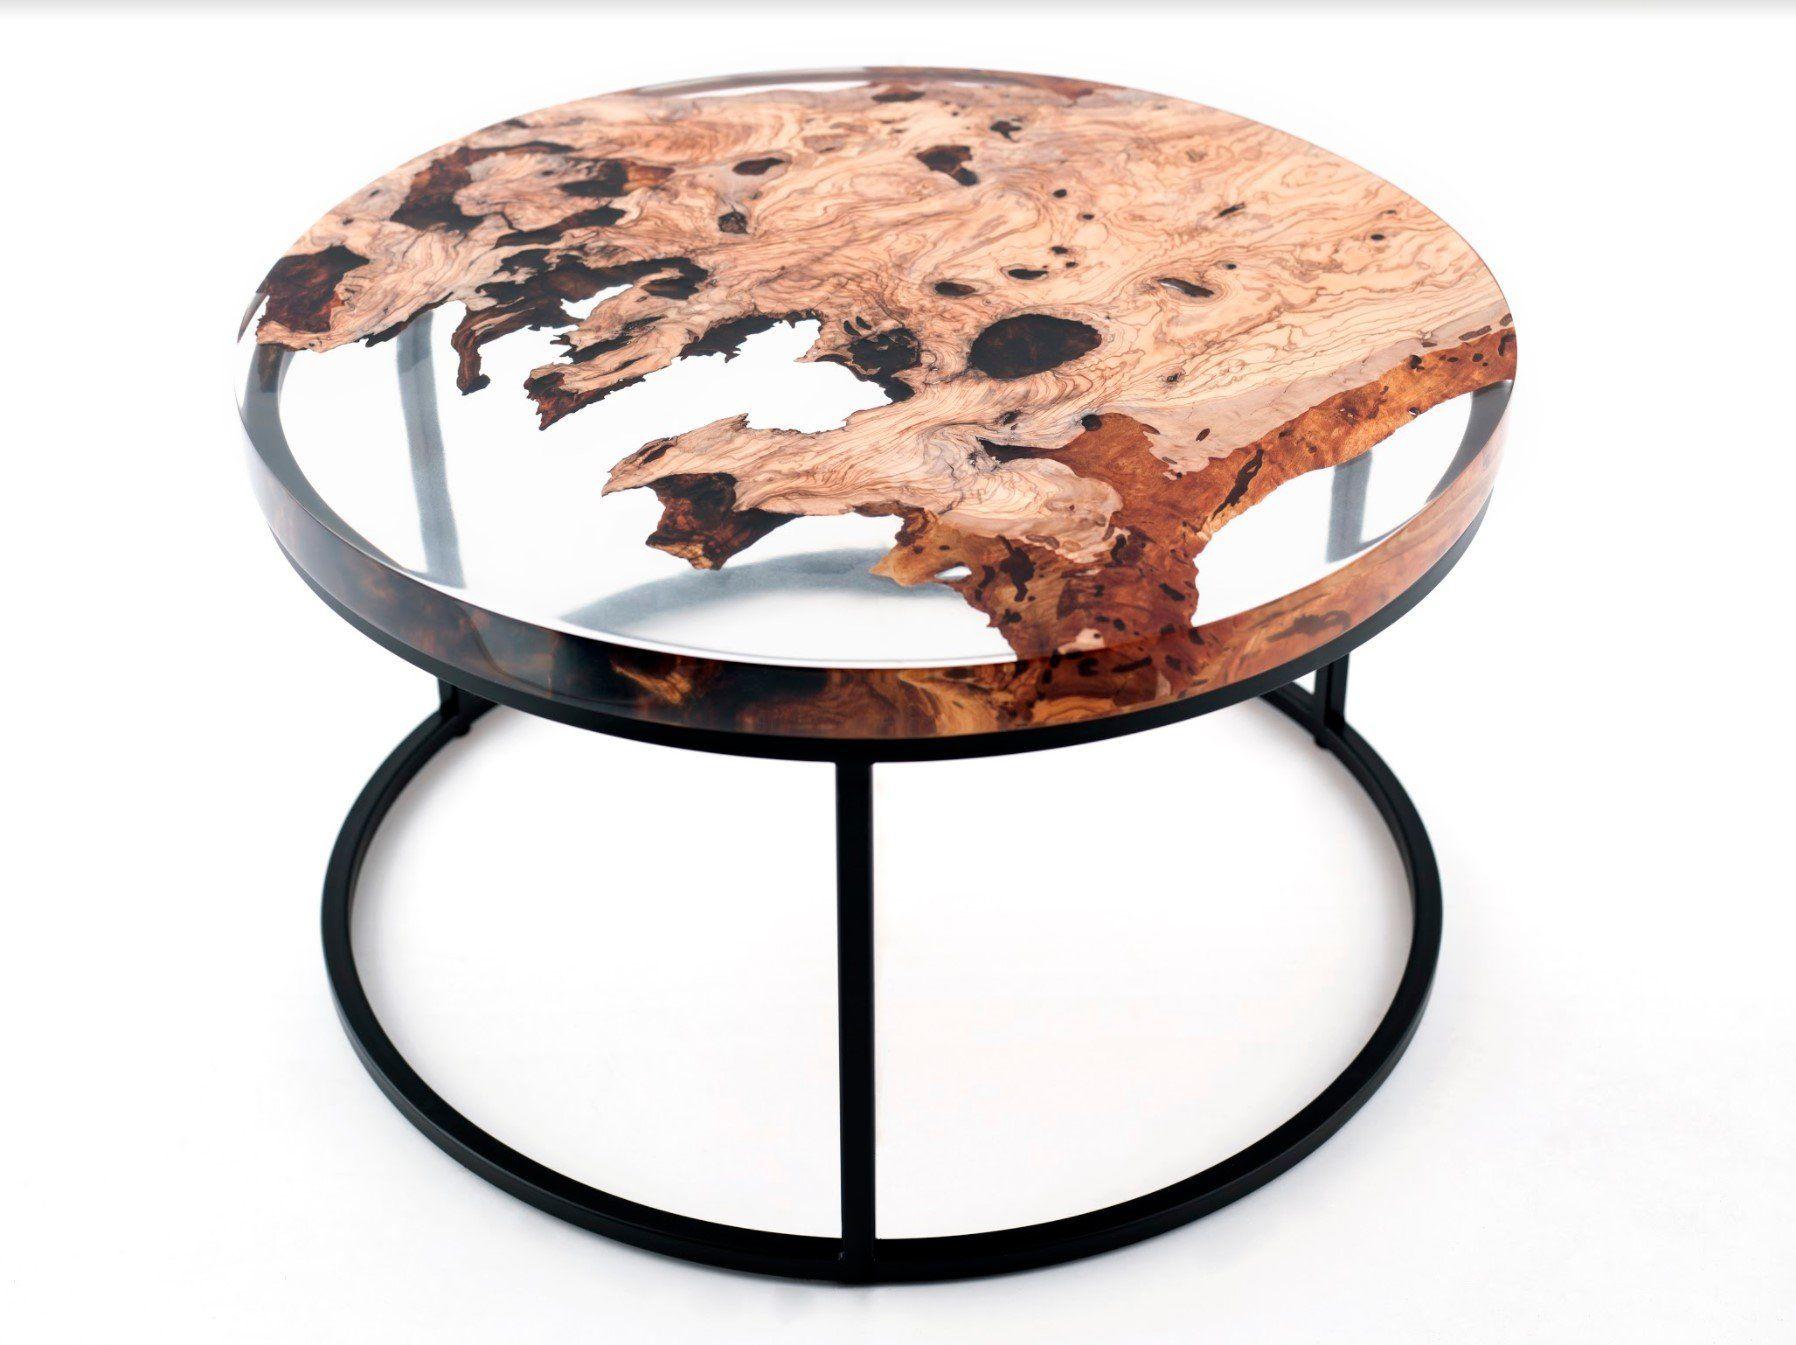 Zeytin 80 Coffee Table Naturalist Usa Resin Table Coffee Table Design Coffee Table [ 1345 x 1796 Pixel ]